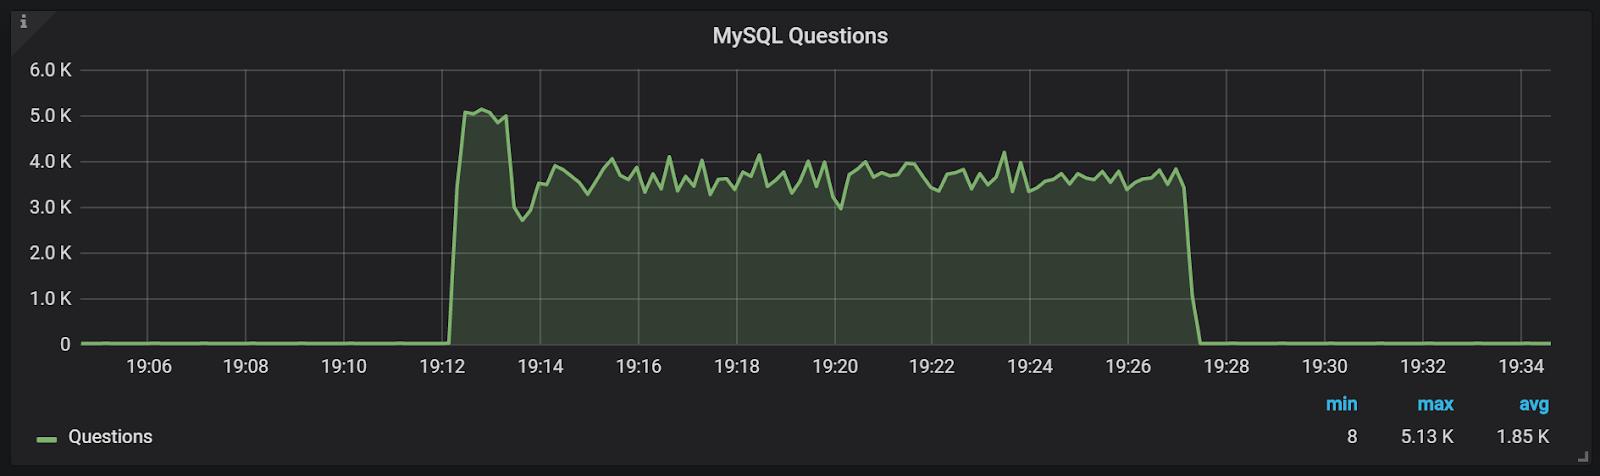 PMM graph of first three minutes db warm up